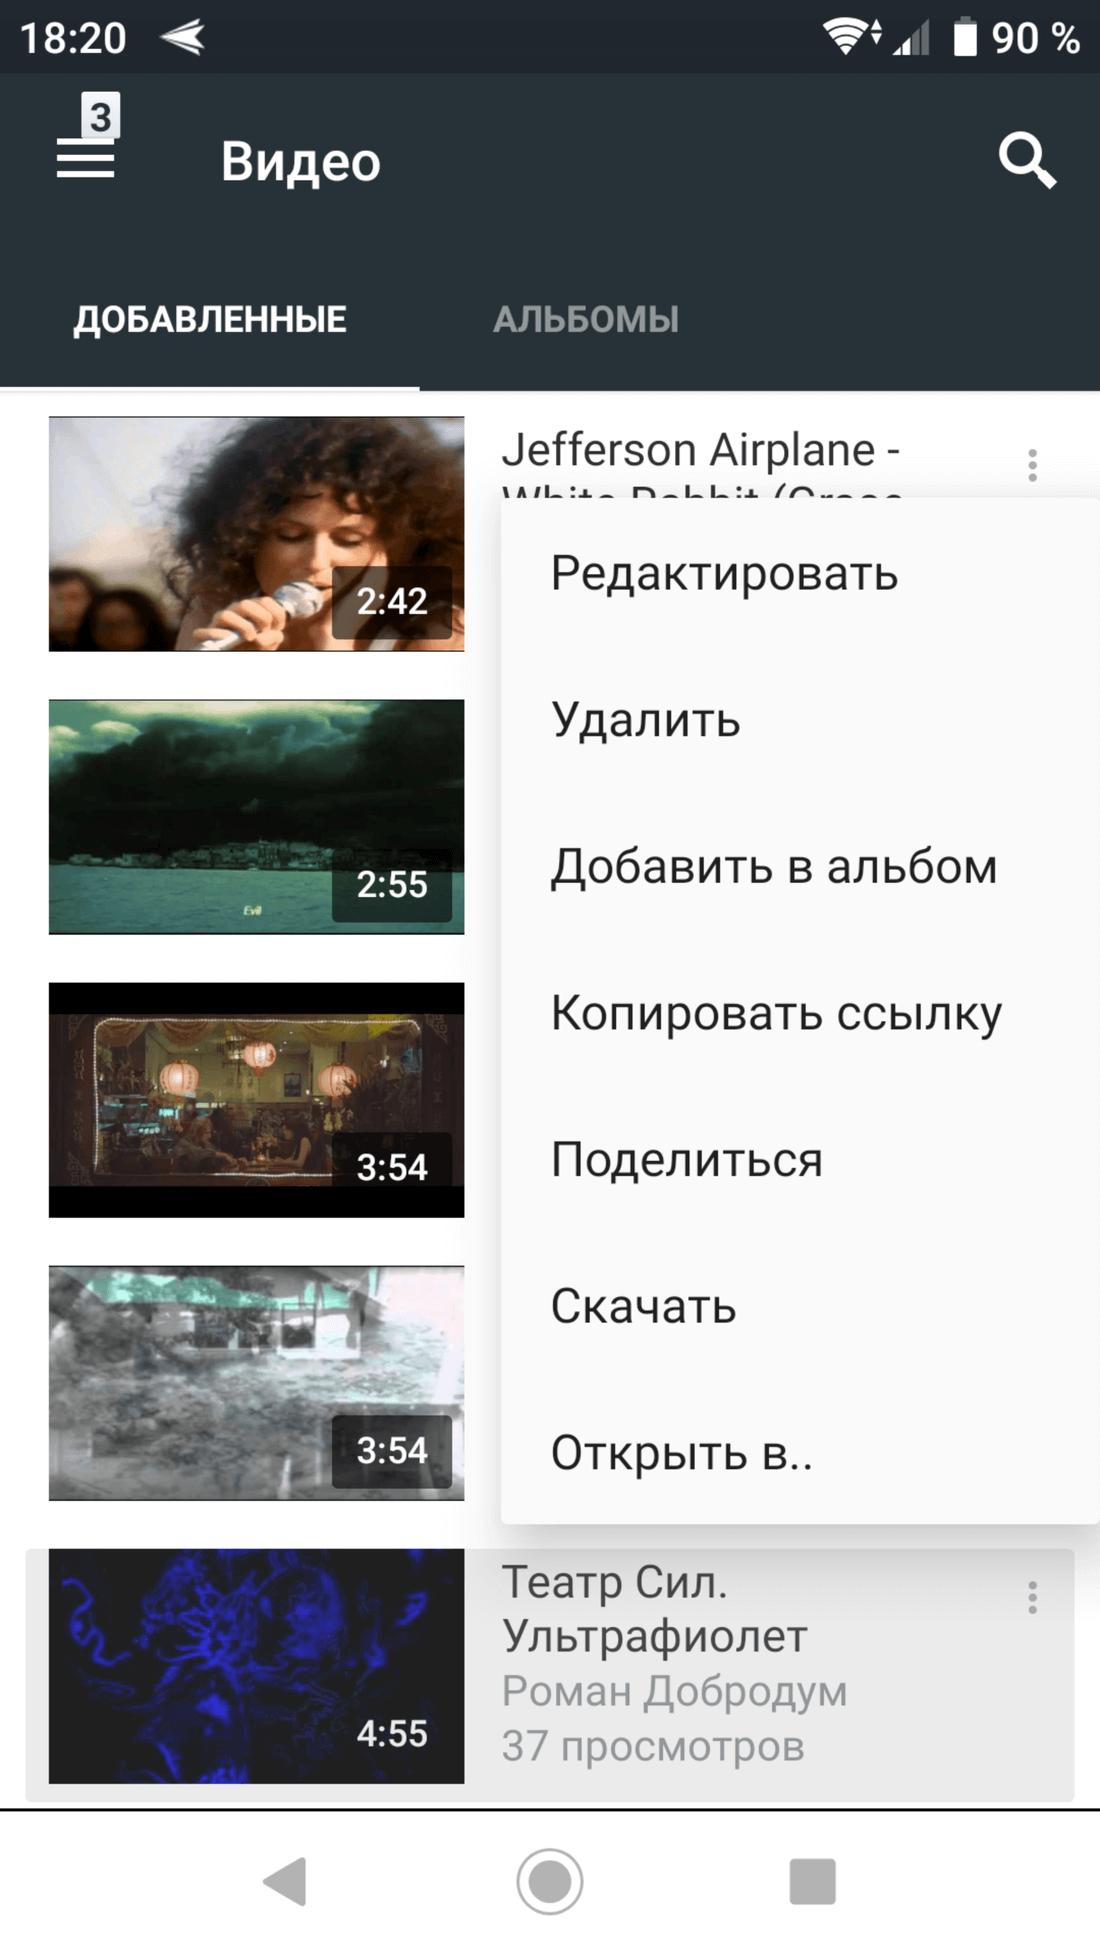 Скриншот #5 из программы VK MP3 MOD